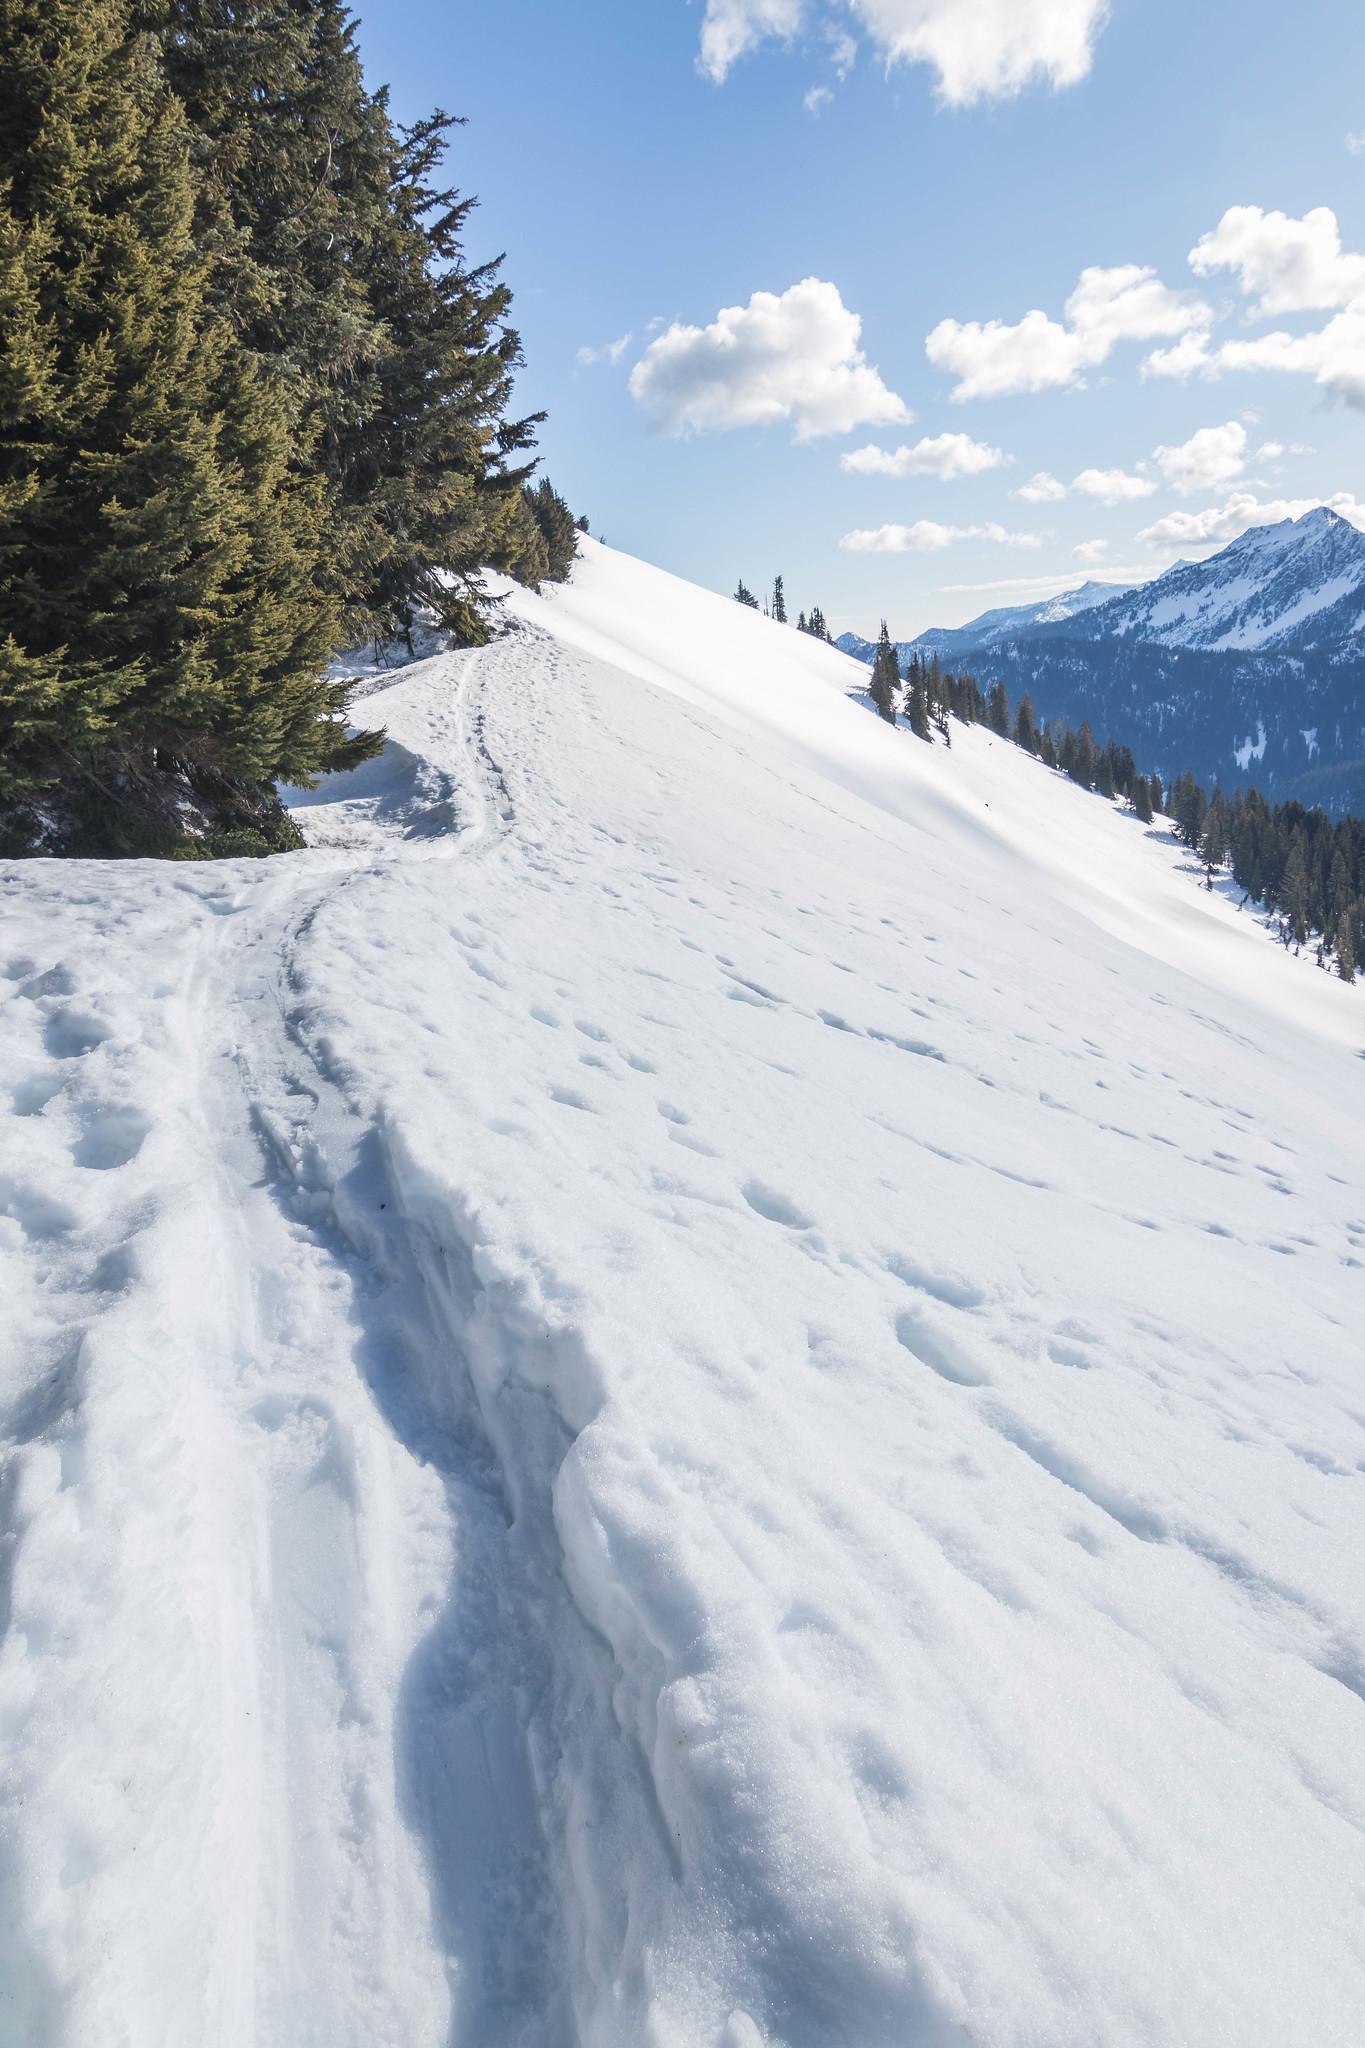 Onward to Big Chief Mountain summit